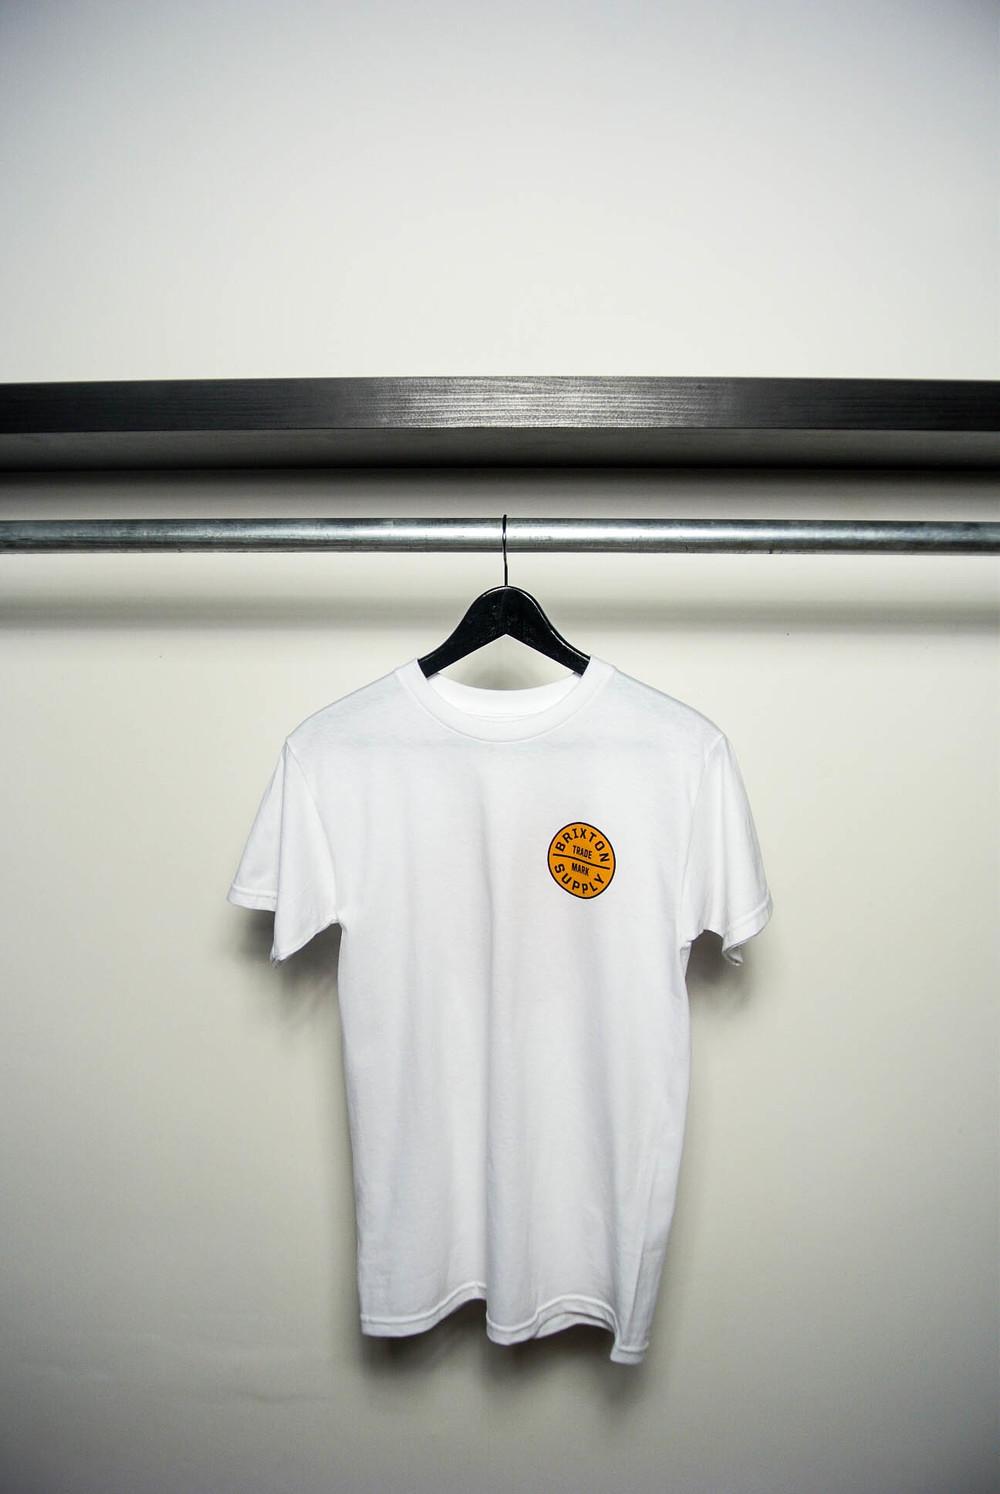 BRIXTON+Oath+Standard+Tee+White-Burnt+Orange_Holy+Rail_F